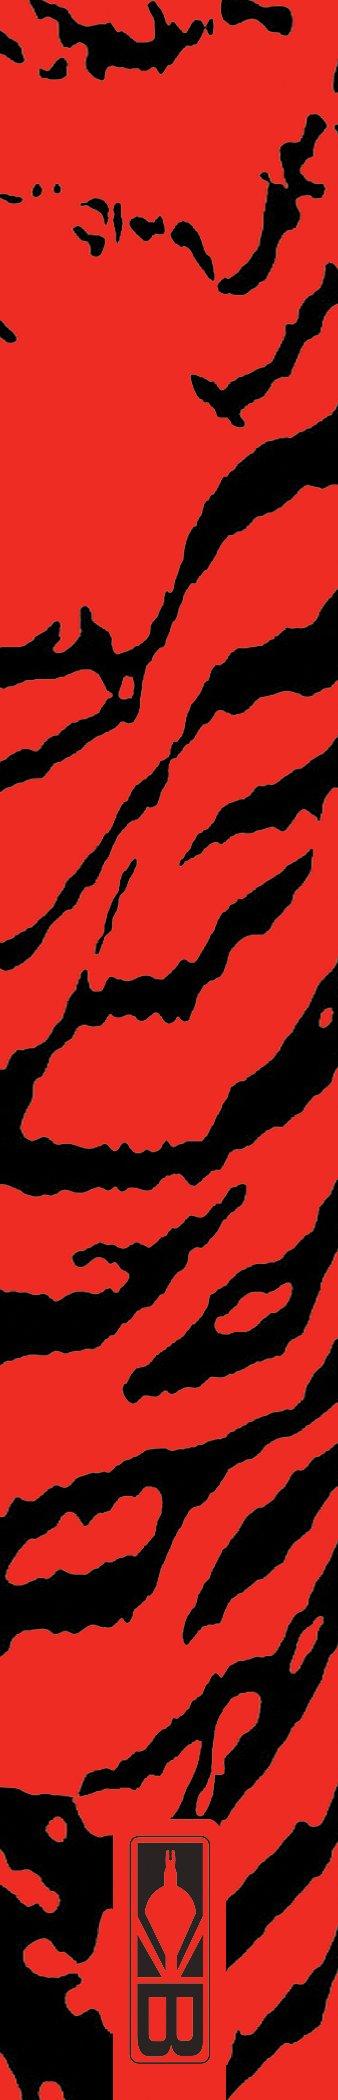 Bohning 7'' Printed Wrap 7'' Red Tiger Standard Arrow Wrap, 12pk by Bohning